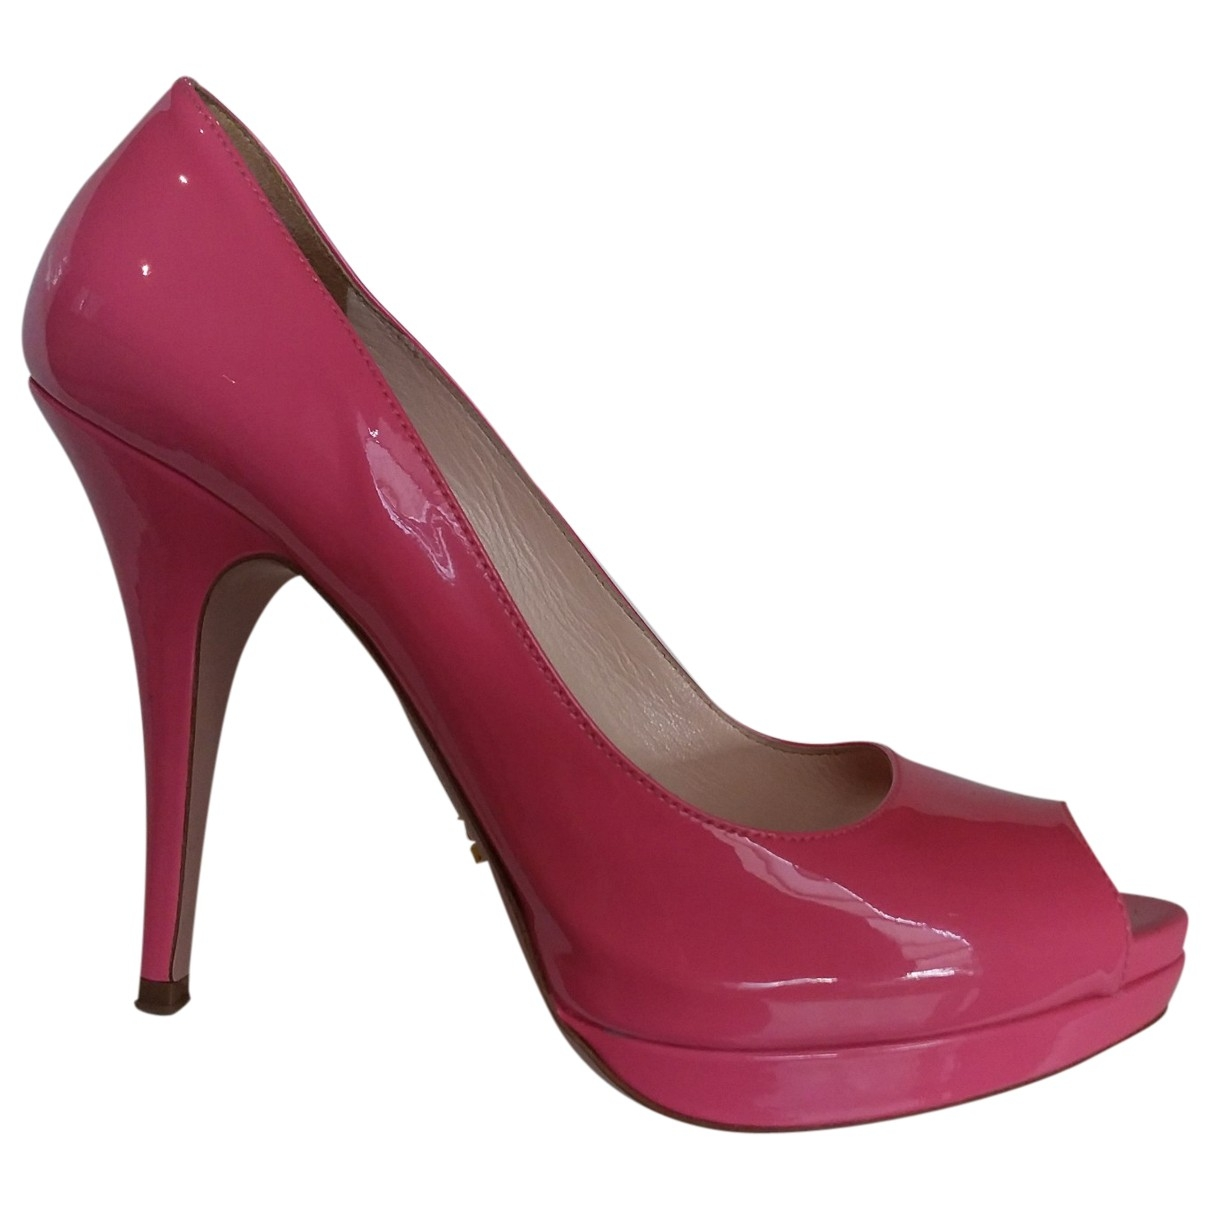 Prada \N Pink Patent leather Heels for Women 38.5 EU